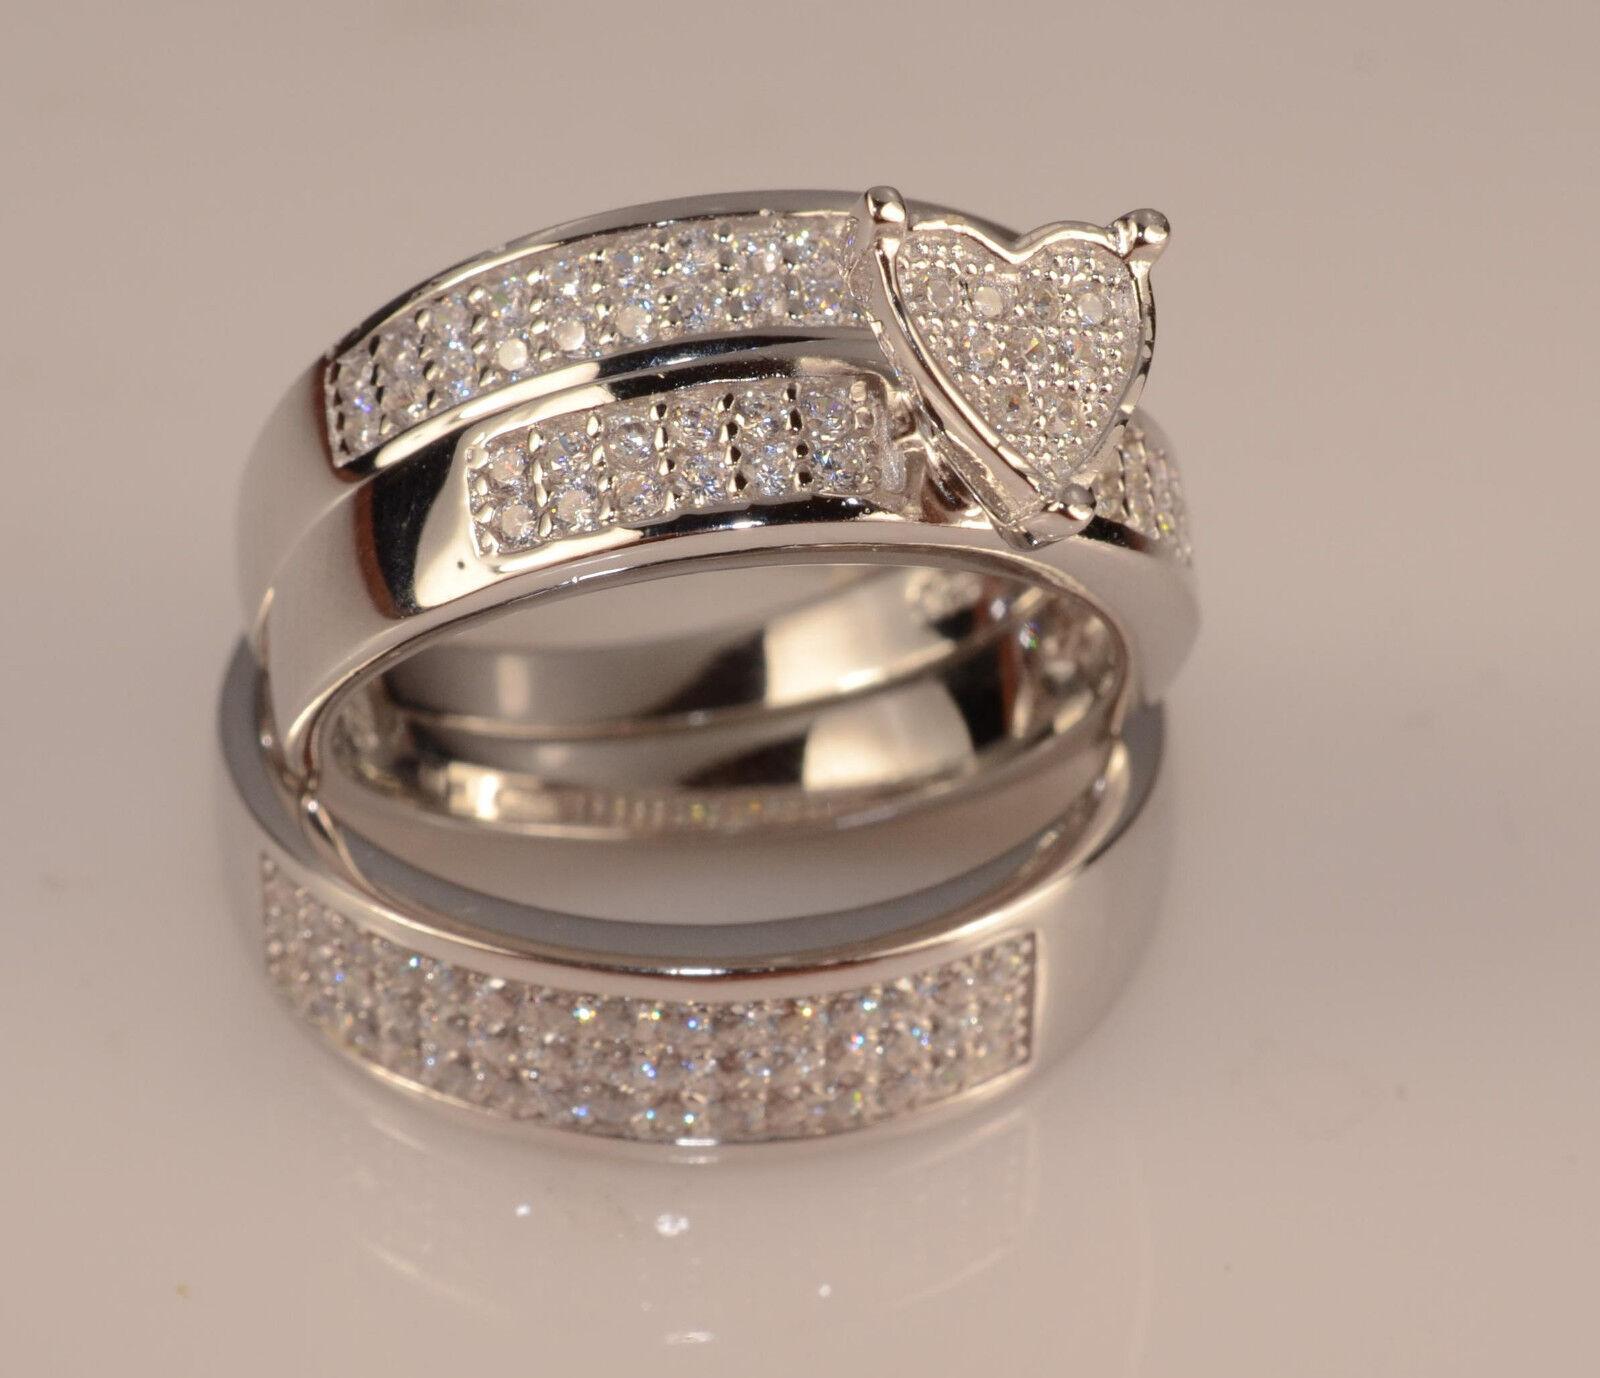 Men & Ladies White gold Finish Trio Set Wedding Engagement Rings  L9 m 12